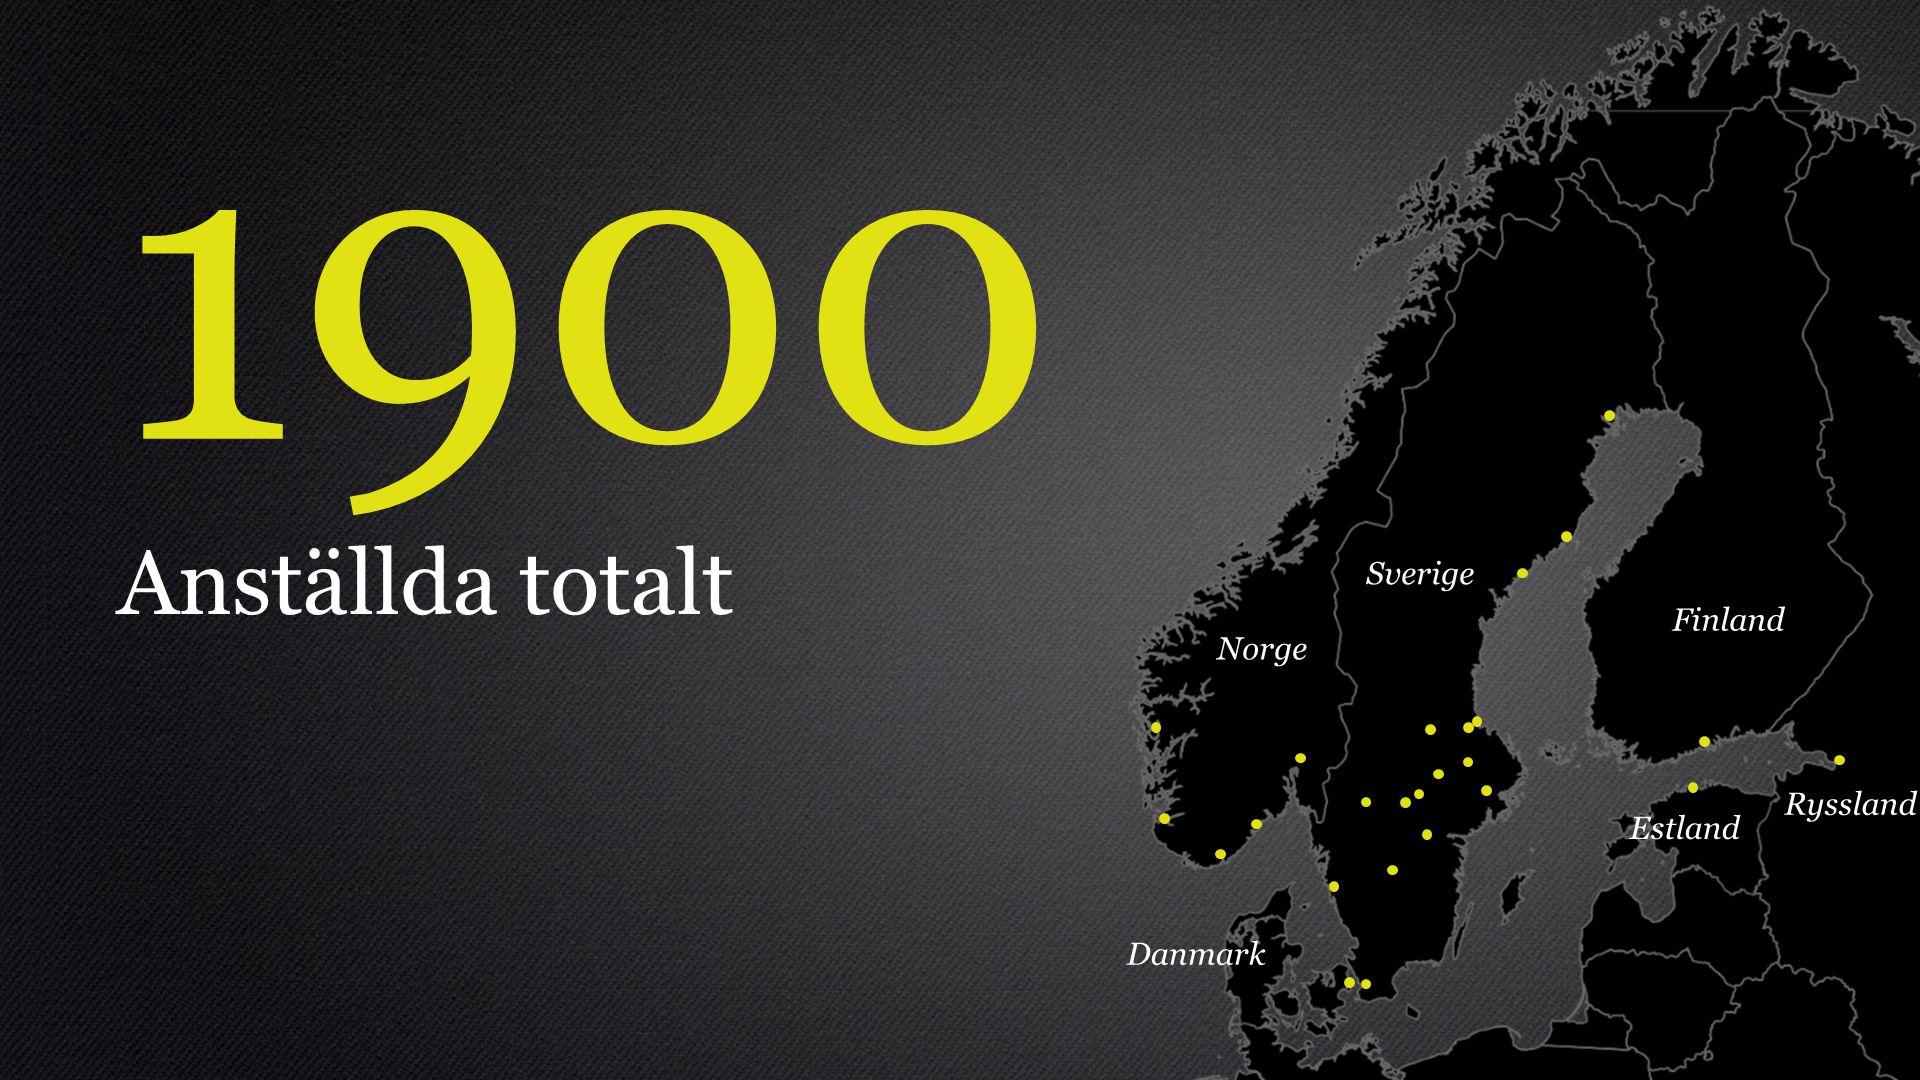 1900 Anställda totalt Sverige Finland Norge Ryssland Estland Danmark